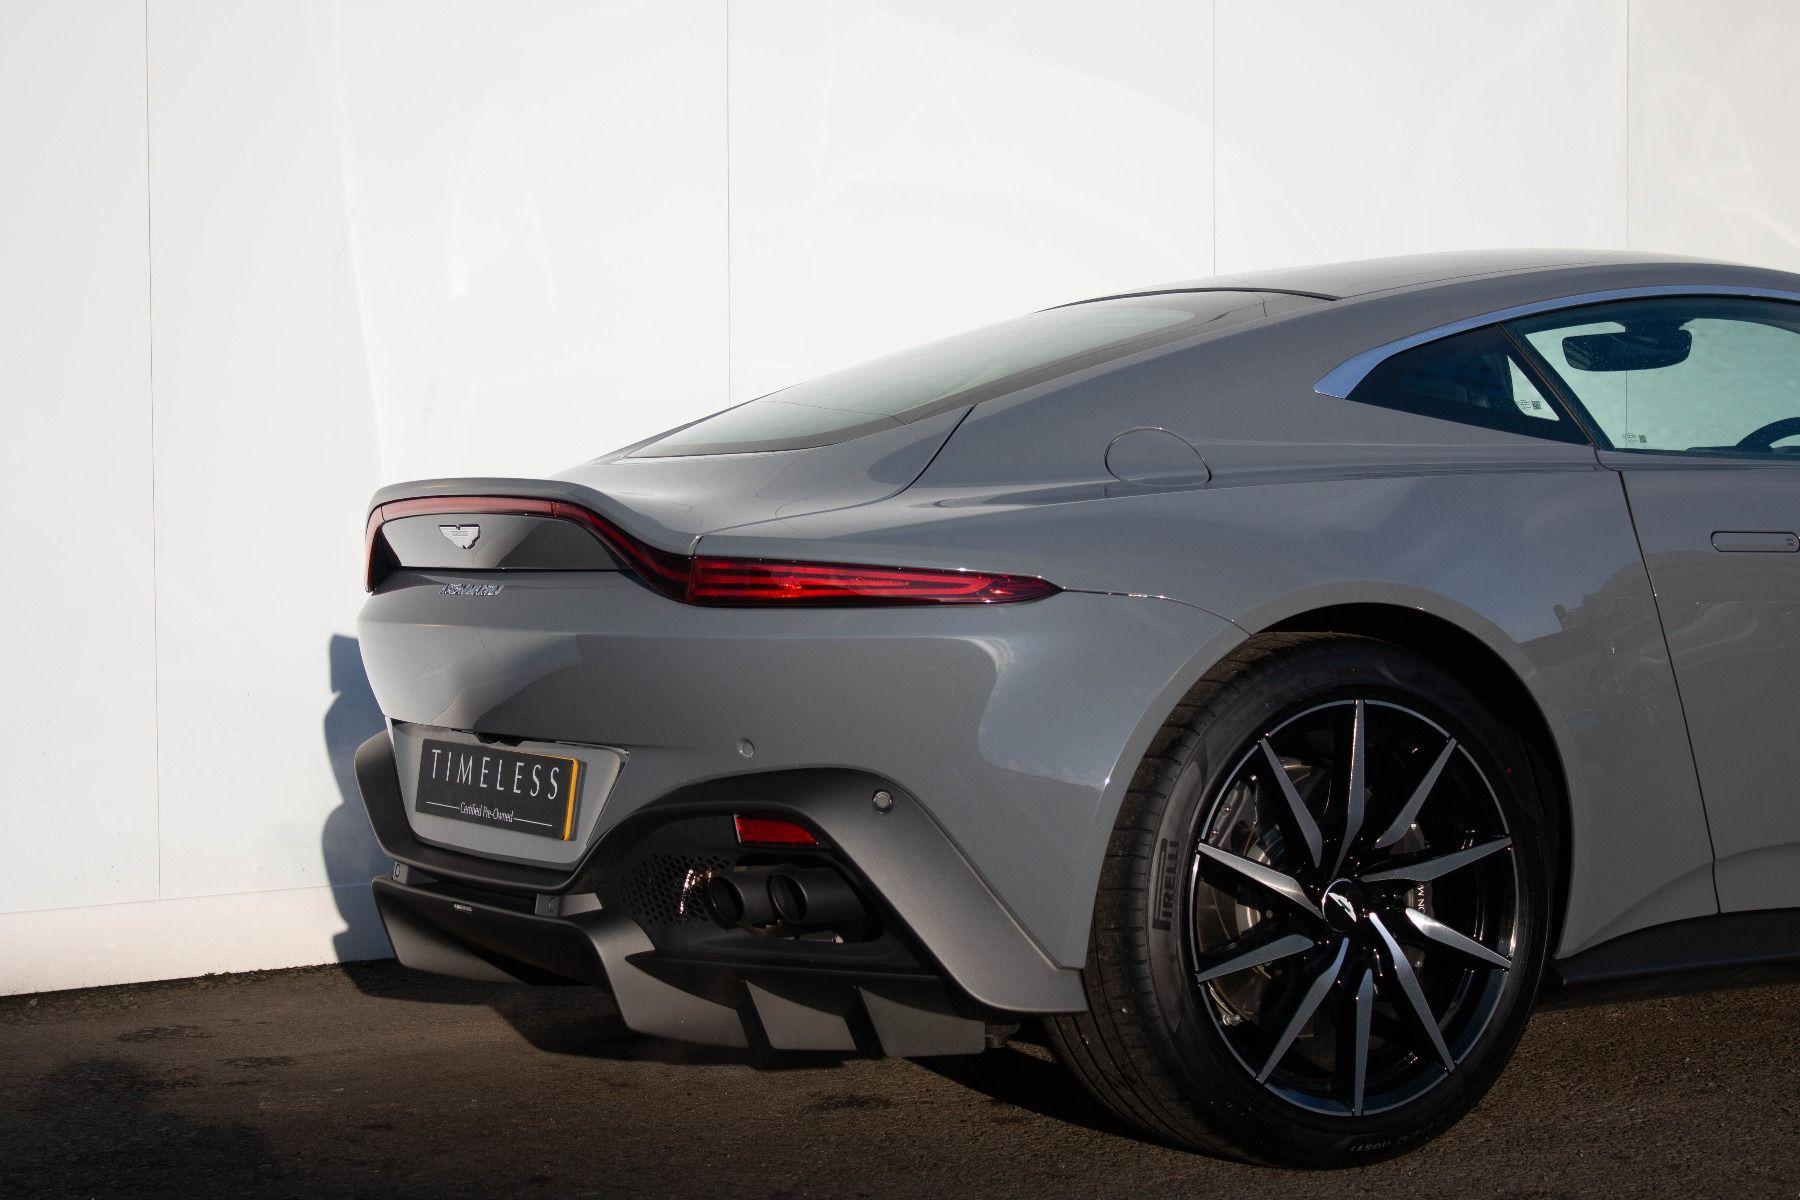 Aston Martin V8 Vantage Coupe 2dr ZF 8 Speed image 8